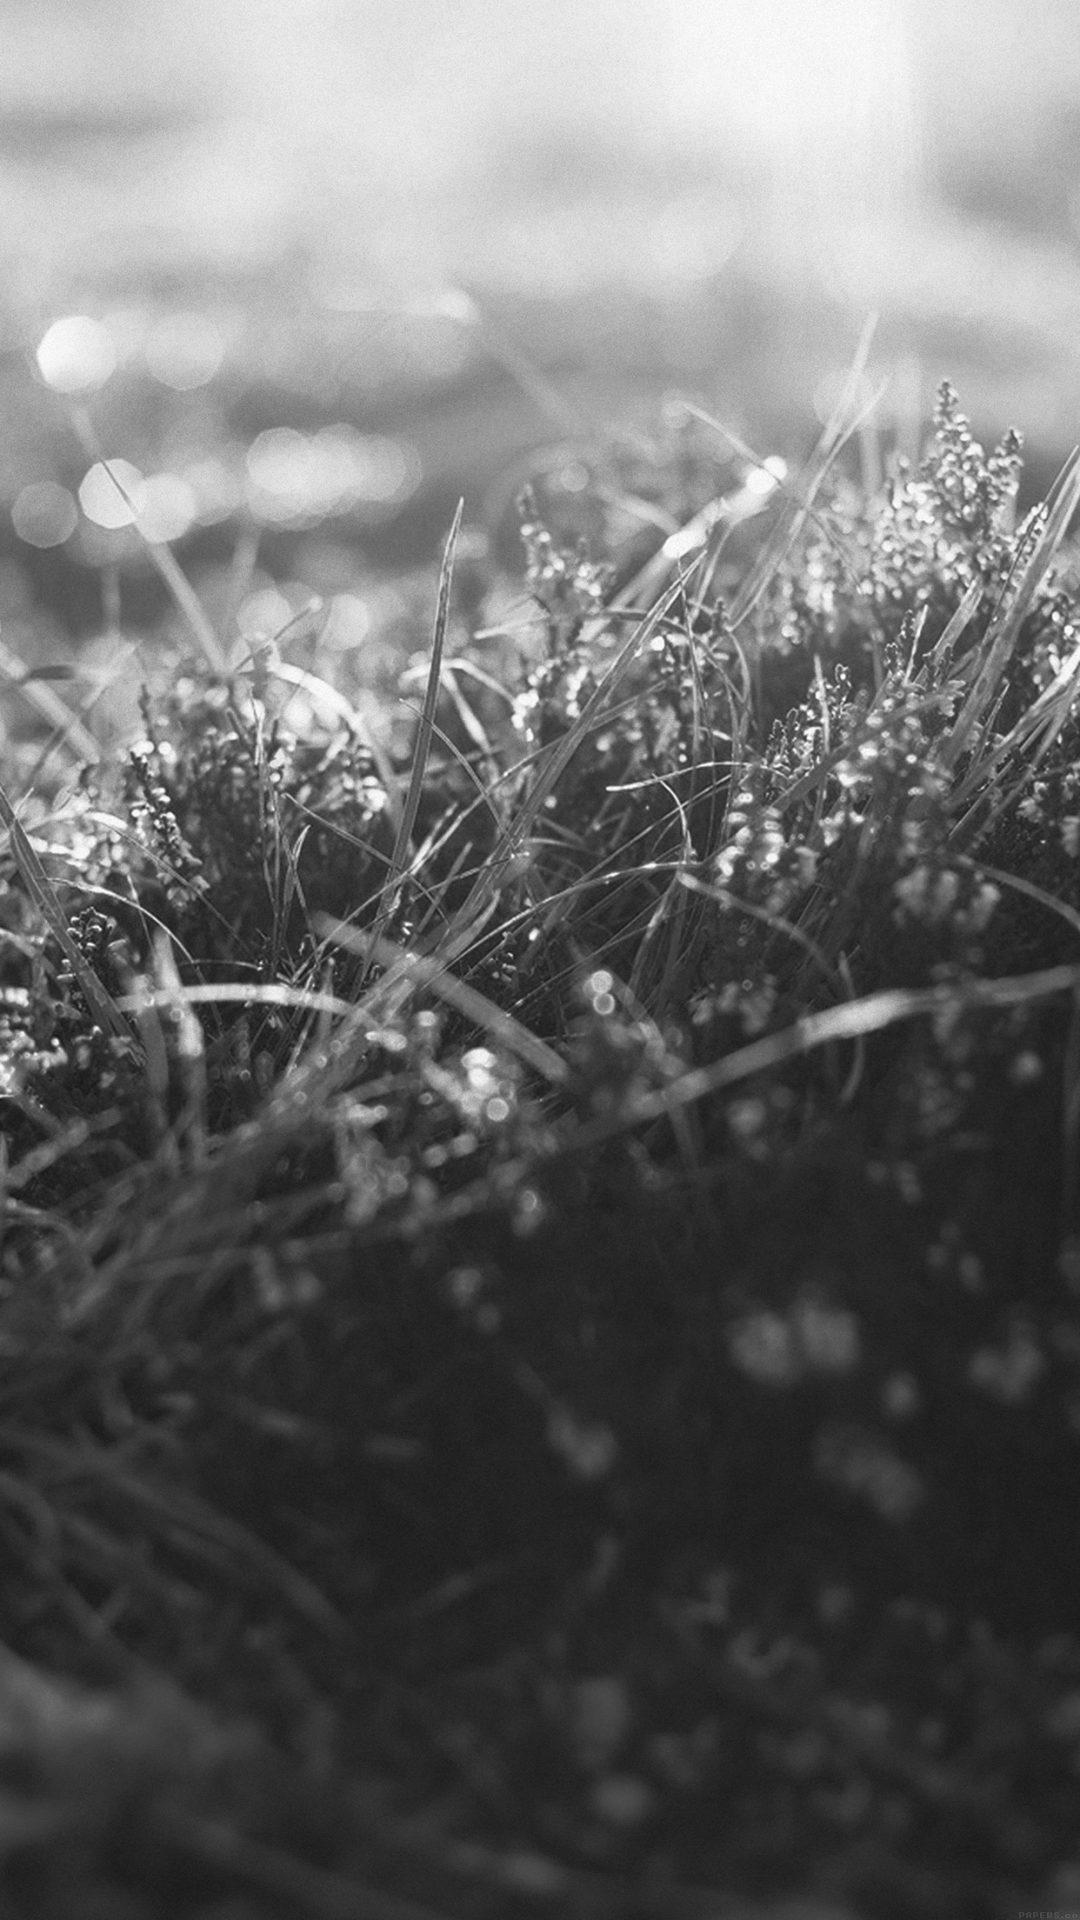 Sun Rise Green Leaf Bw Flower Grass Love Nature